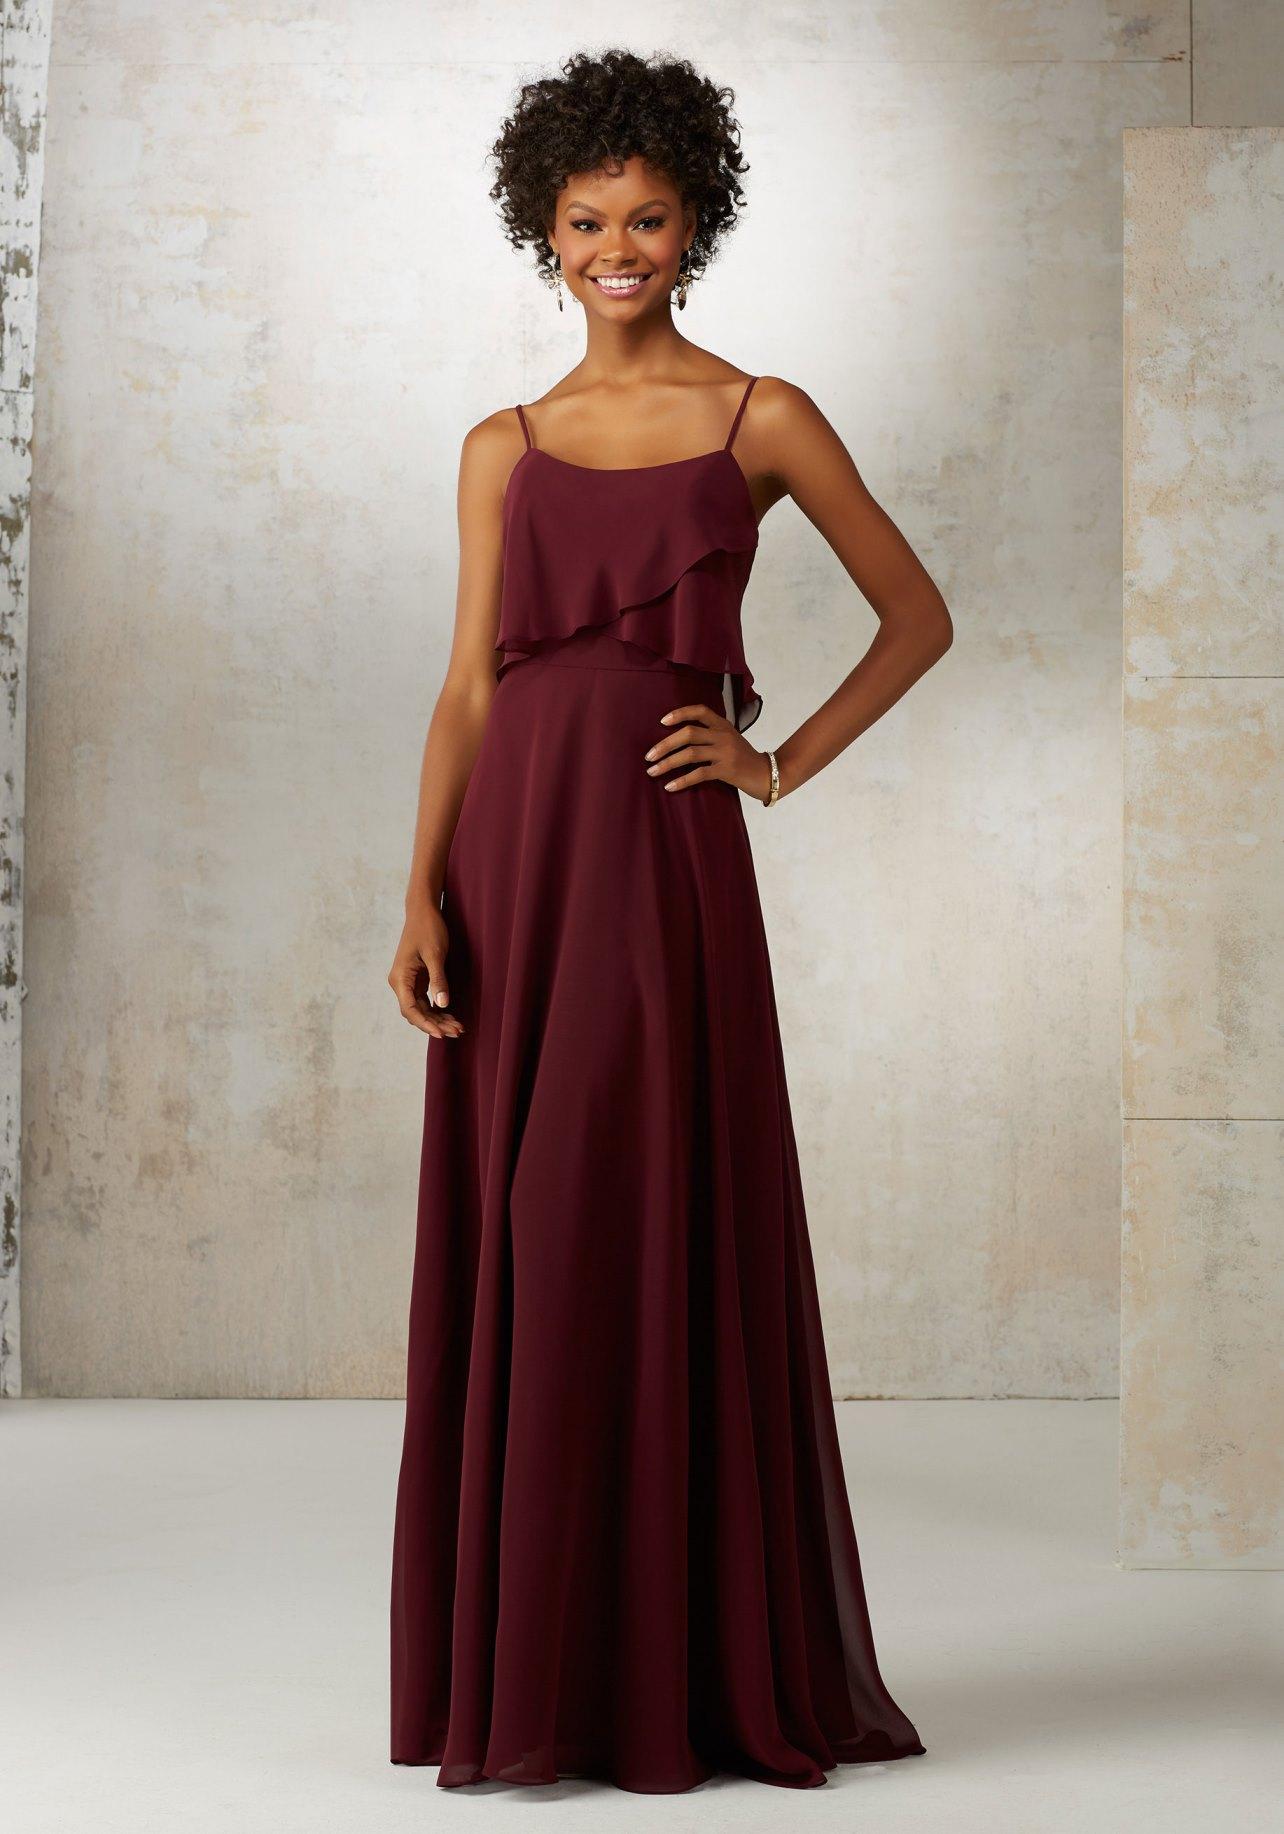 Dress mori lee bridesmaids spring 2017 collection 21515 for Mori lee wedding dresses prices